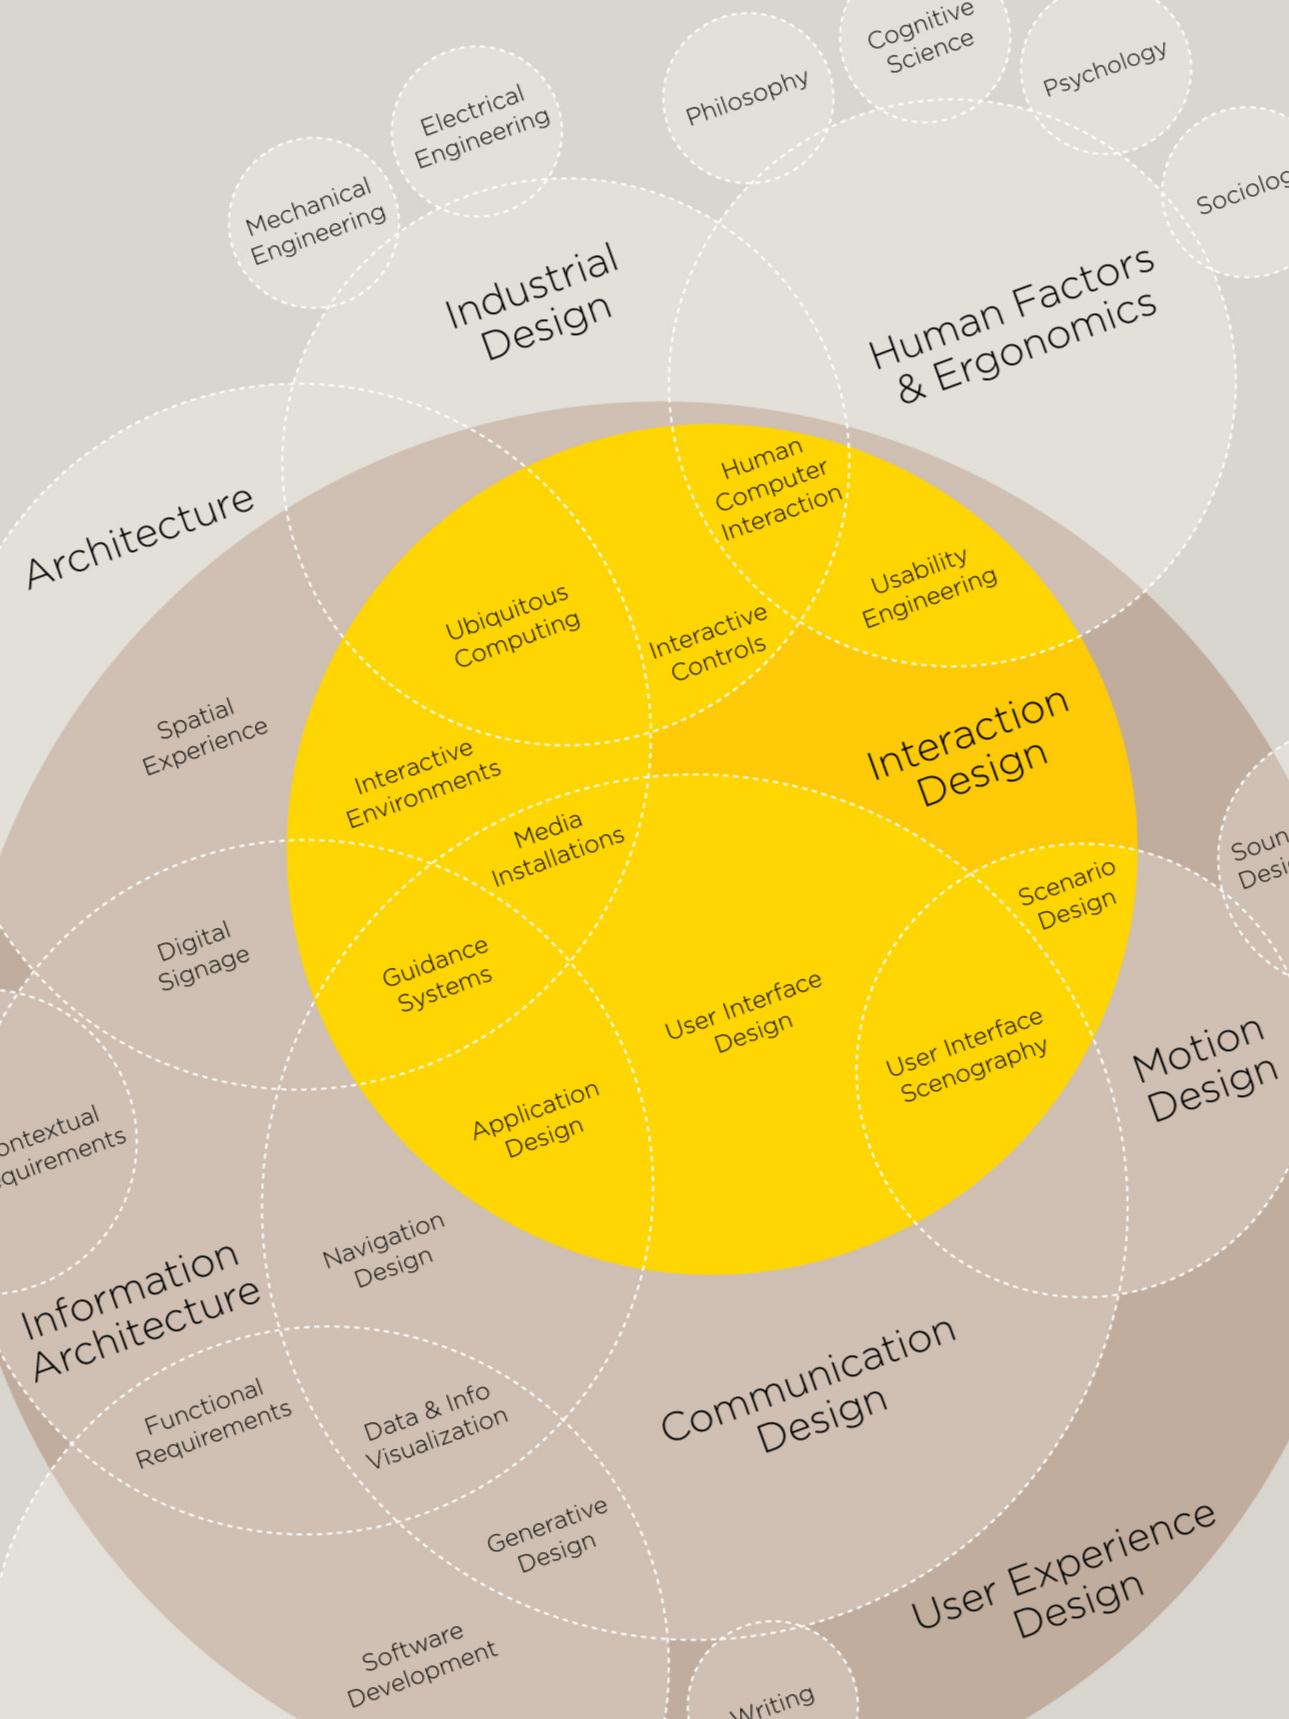 Disciplines-Of-User-Experience-Design-Infographic-infographicsmania.jpg